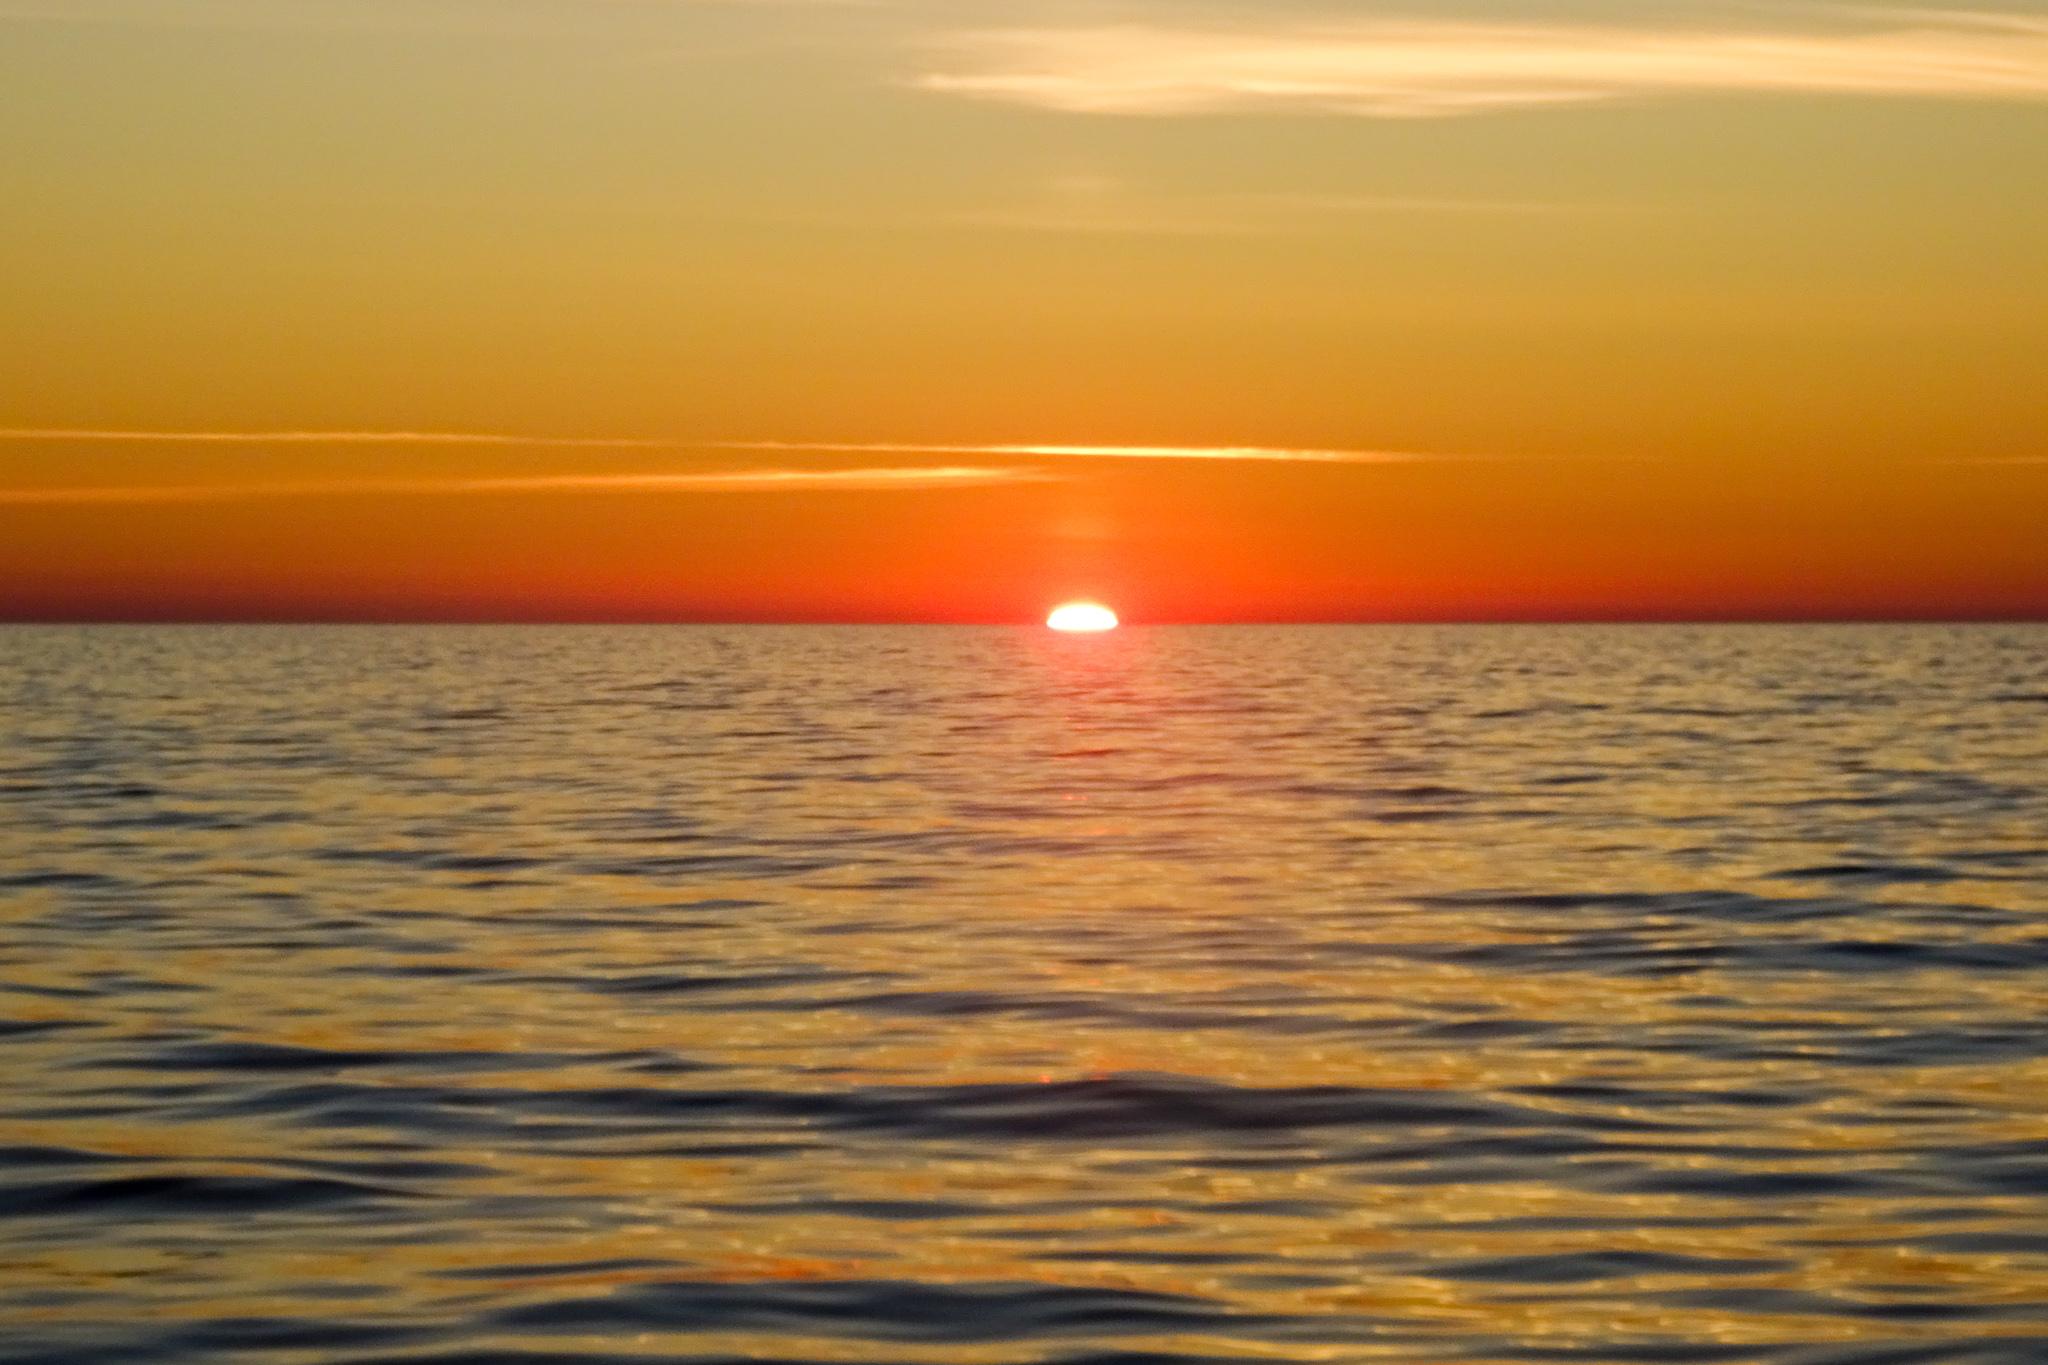 Sonnenuntergang 23:30 Uhr